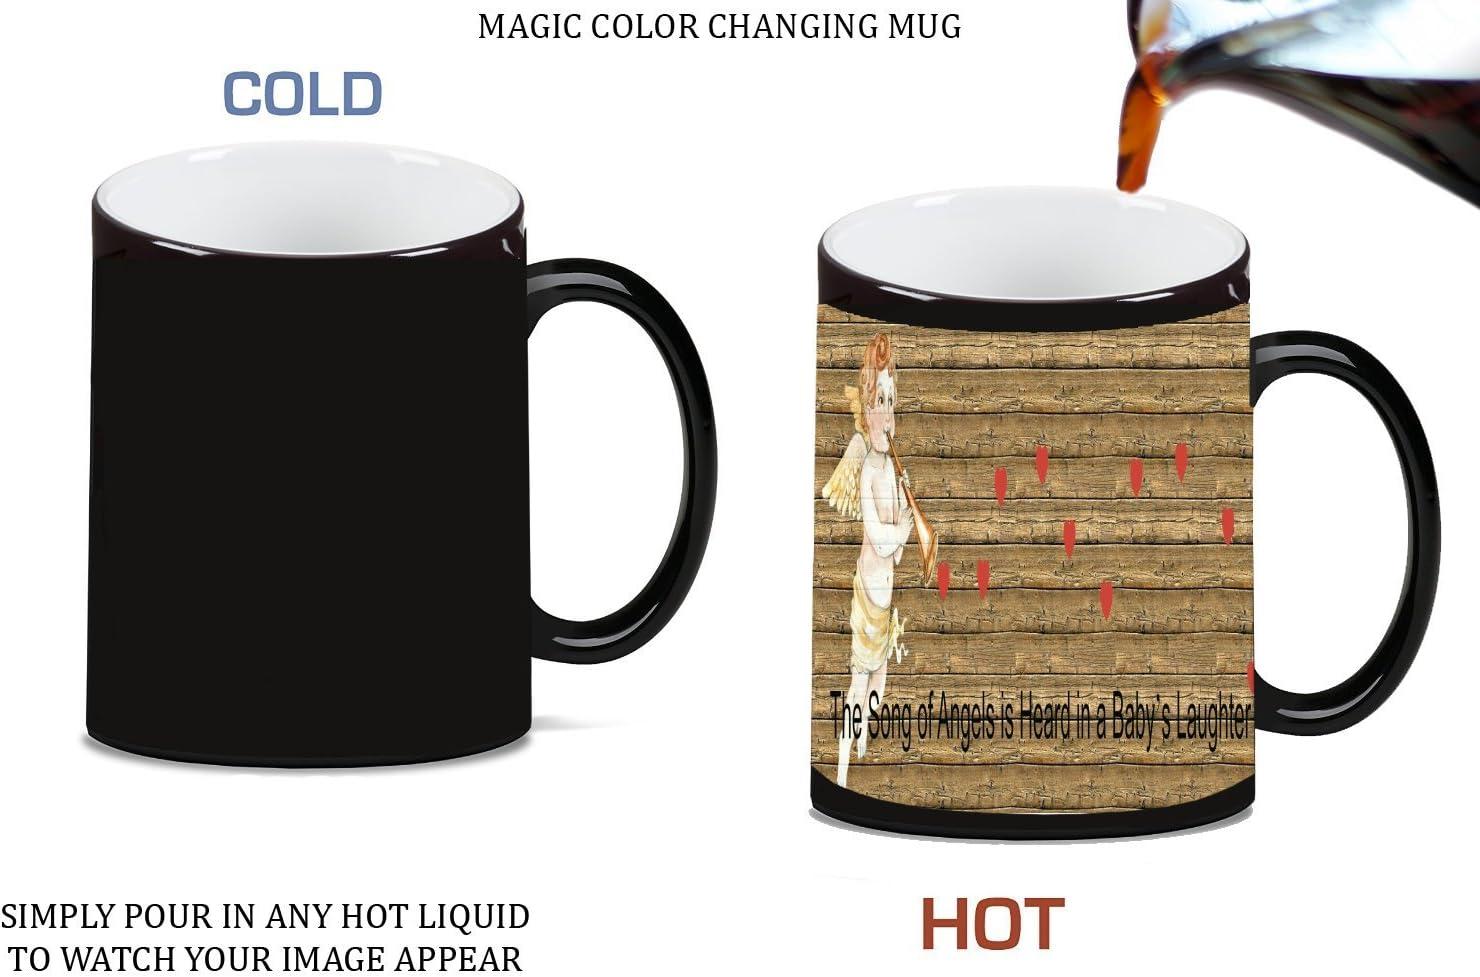 amazon com sticker skin print angel music romantic heart wood background printed design magic color morphing ceramic coffee mug tea cup by smarter designs kitchen dining amazon com